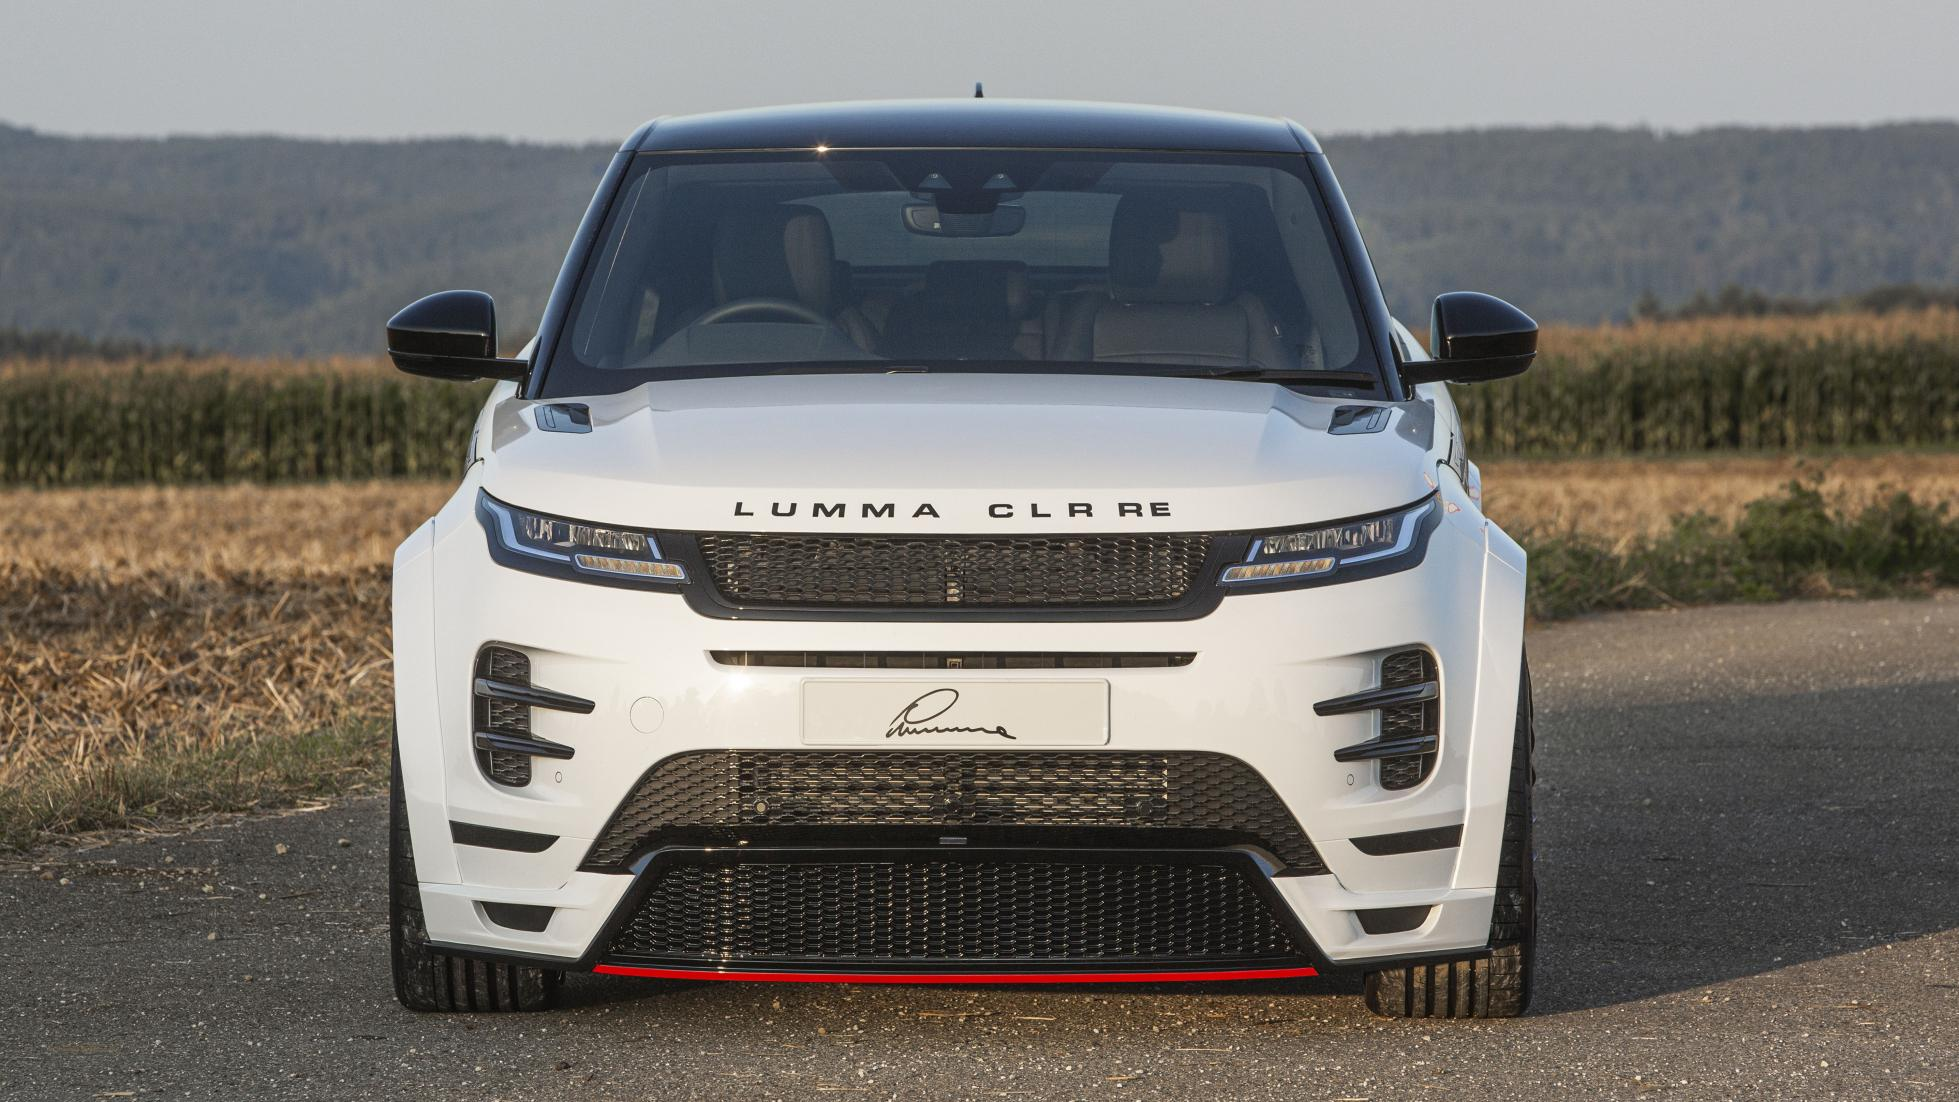 Range-Rover-Evoque-by-Lumma-Design-10